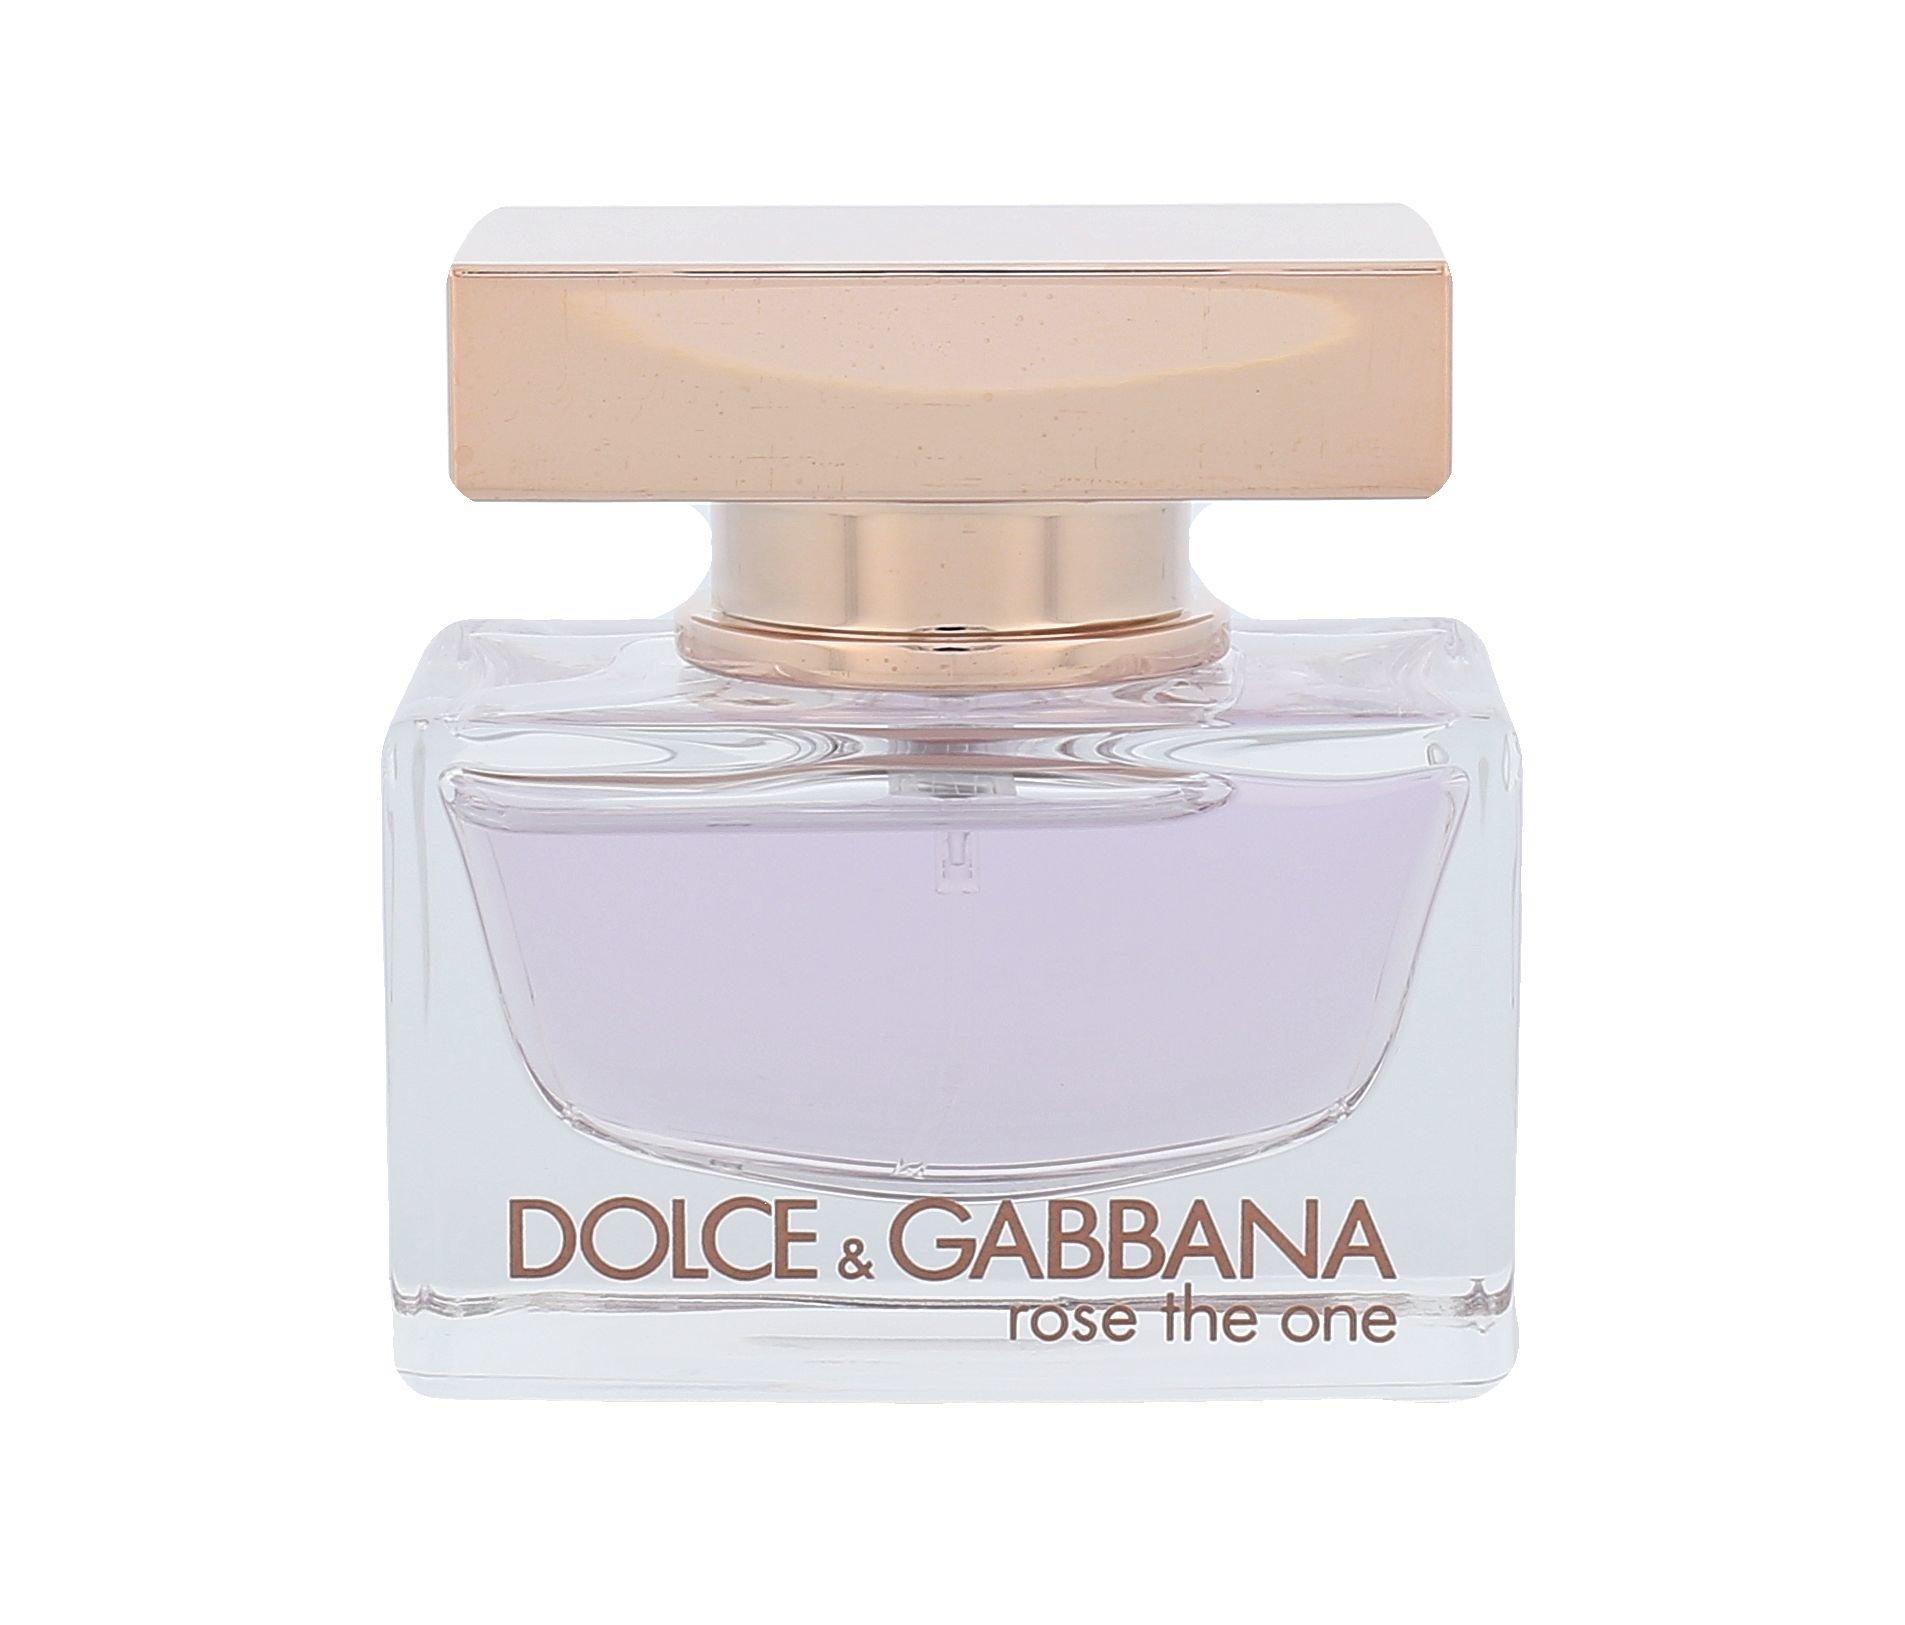 Dolce & Gabbana The One Rose EDP 30ml